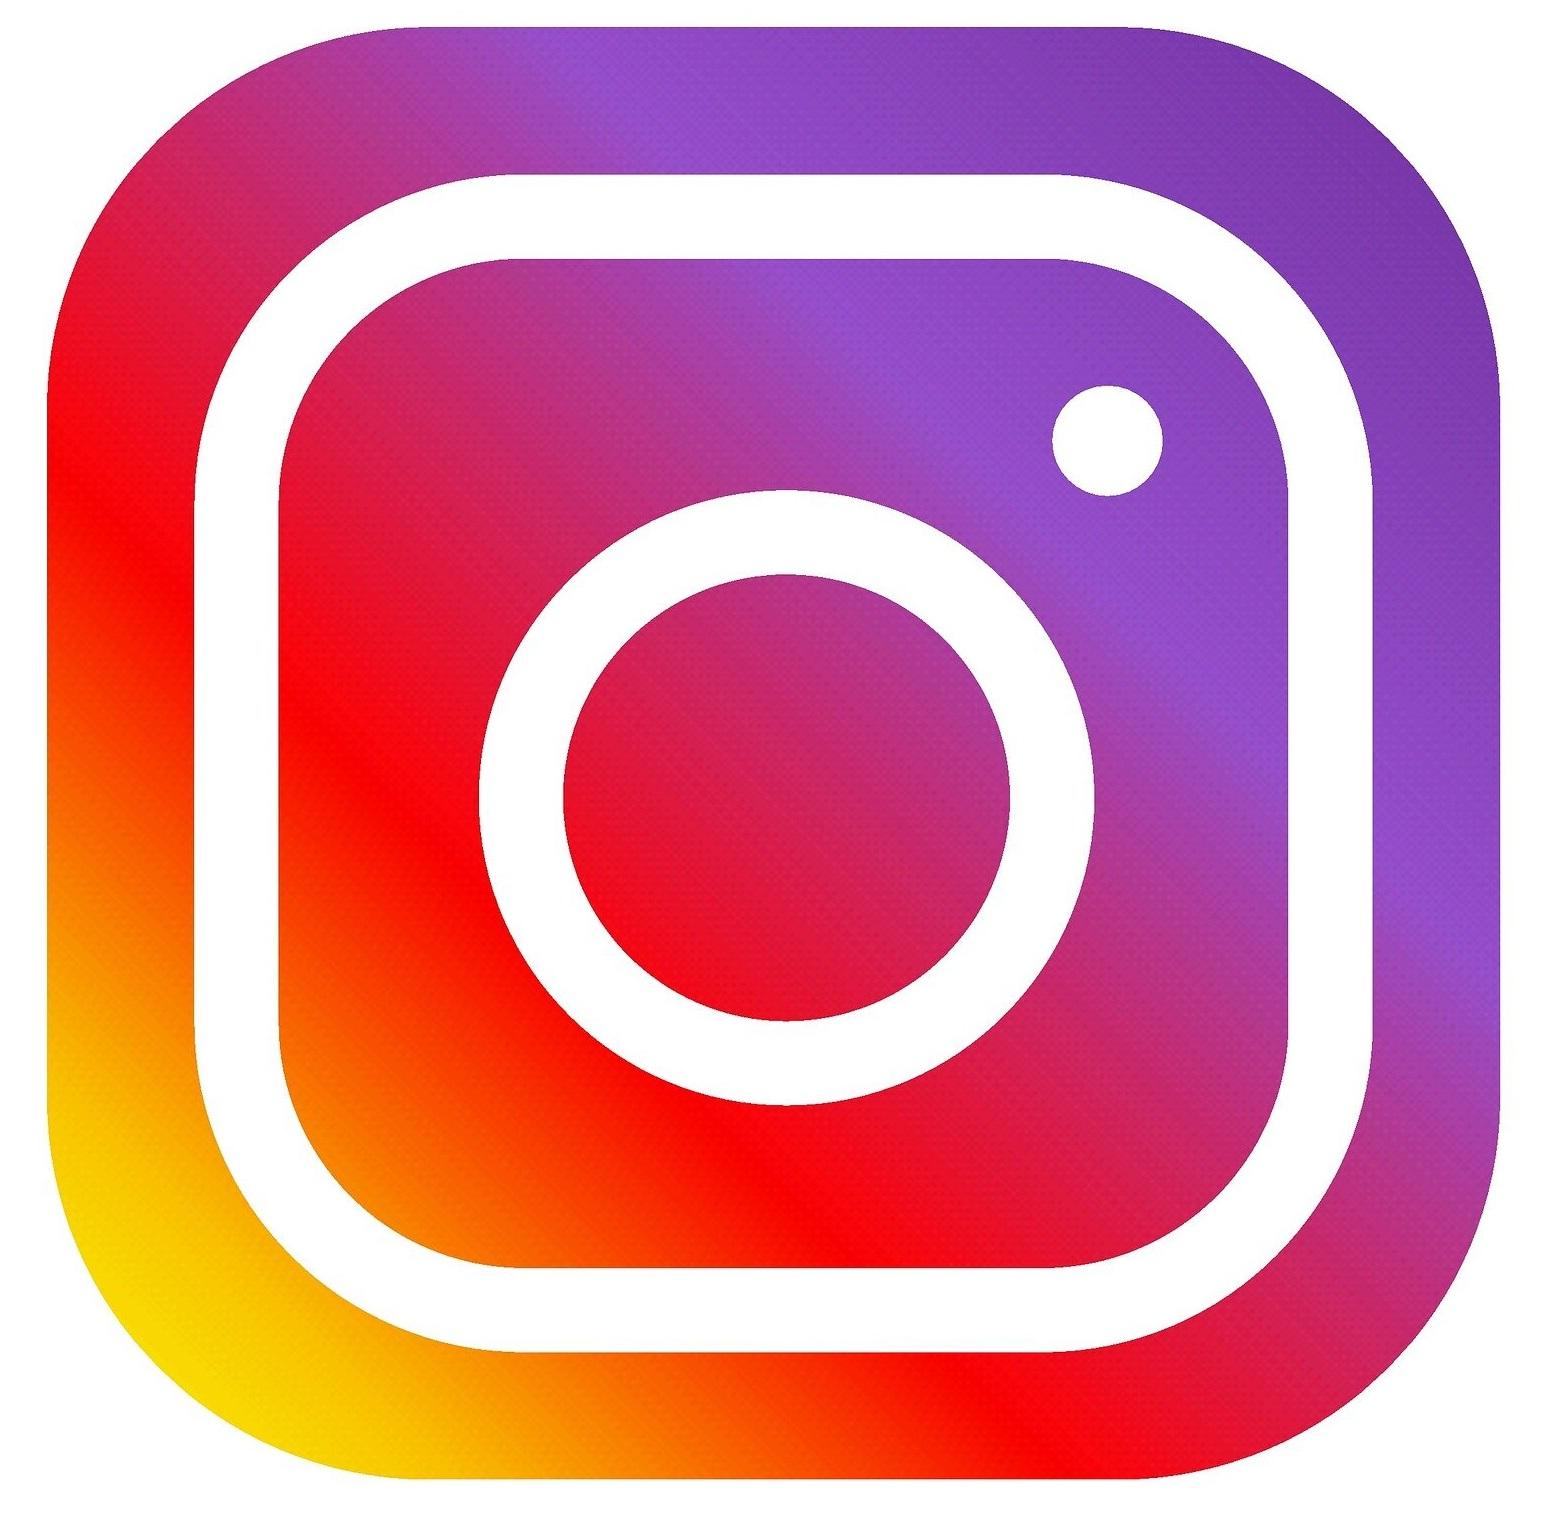 1instagram